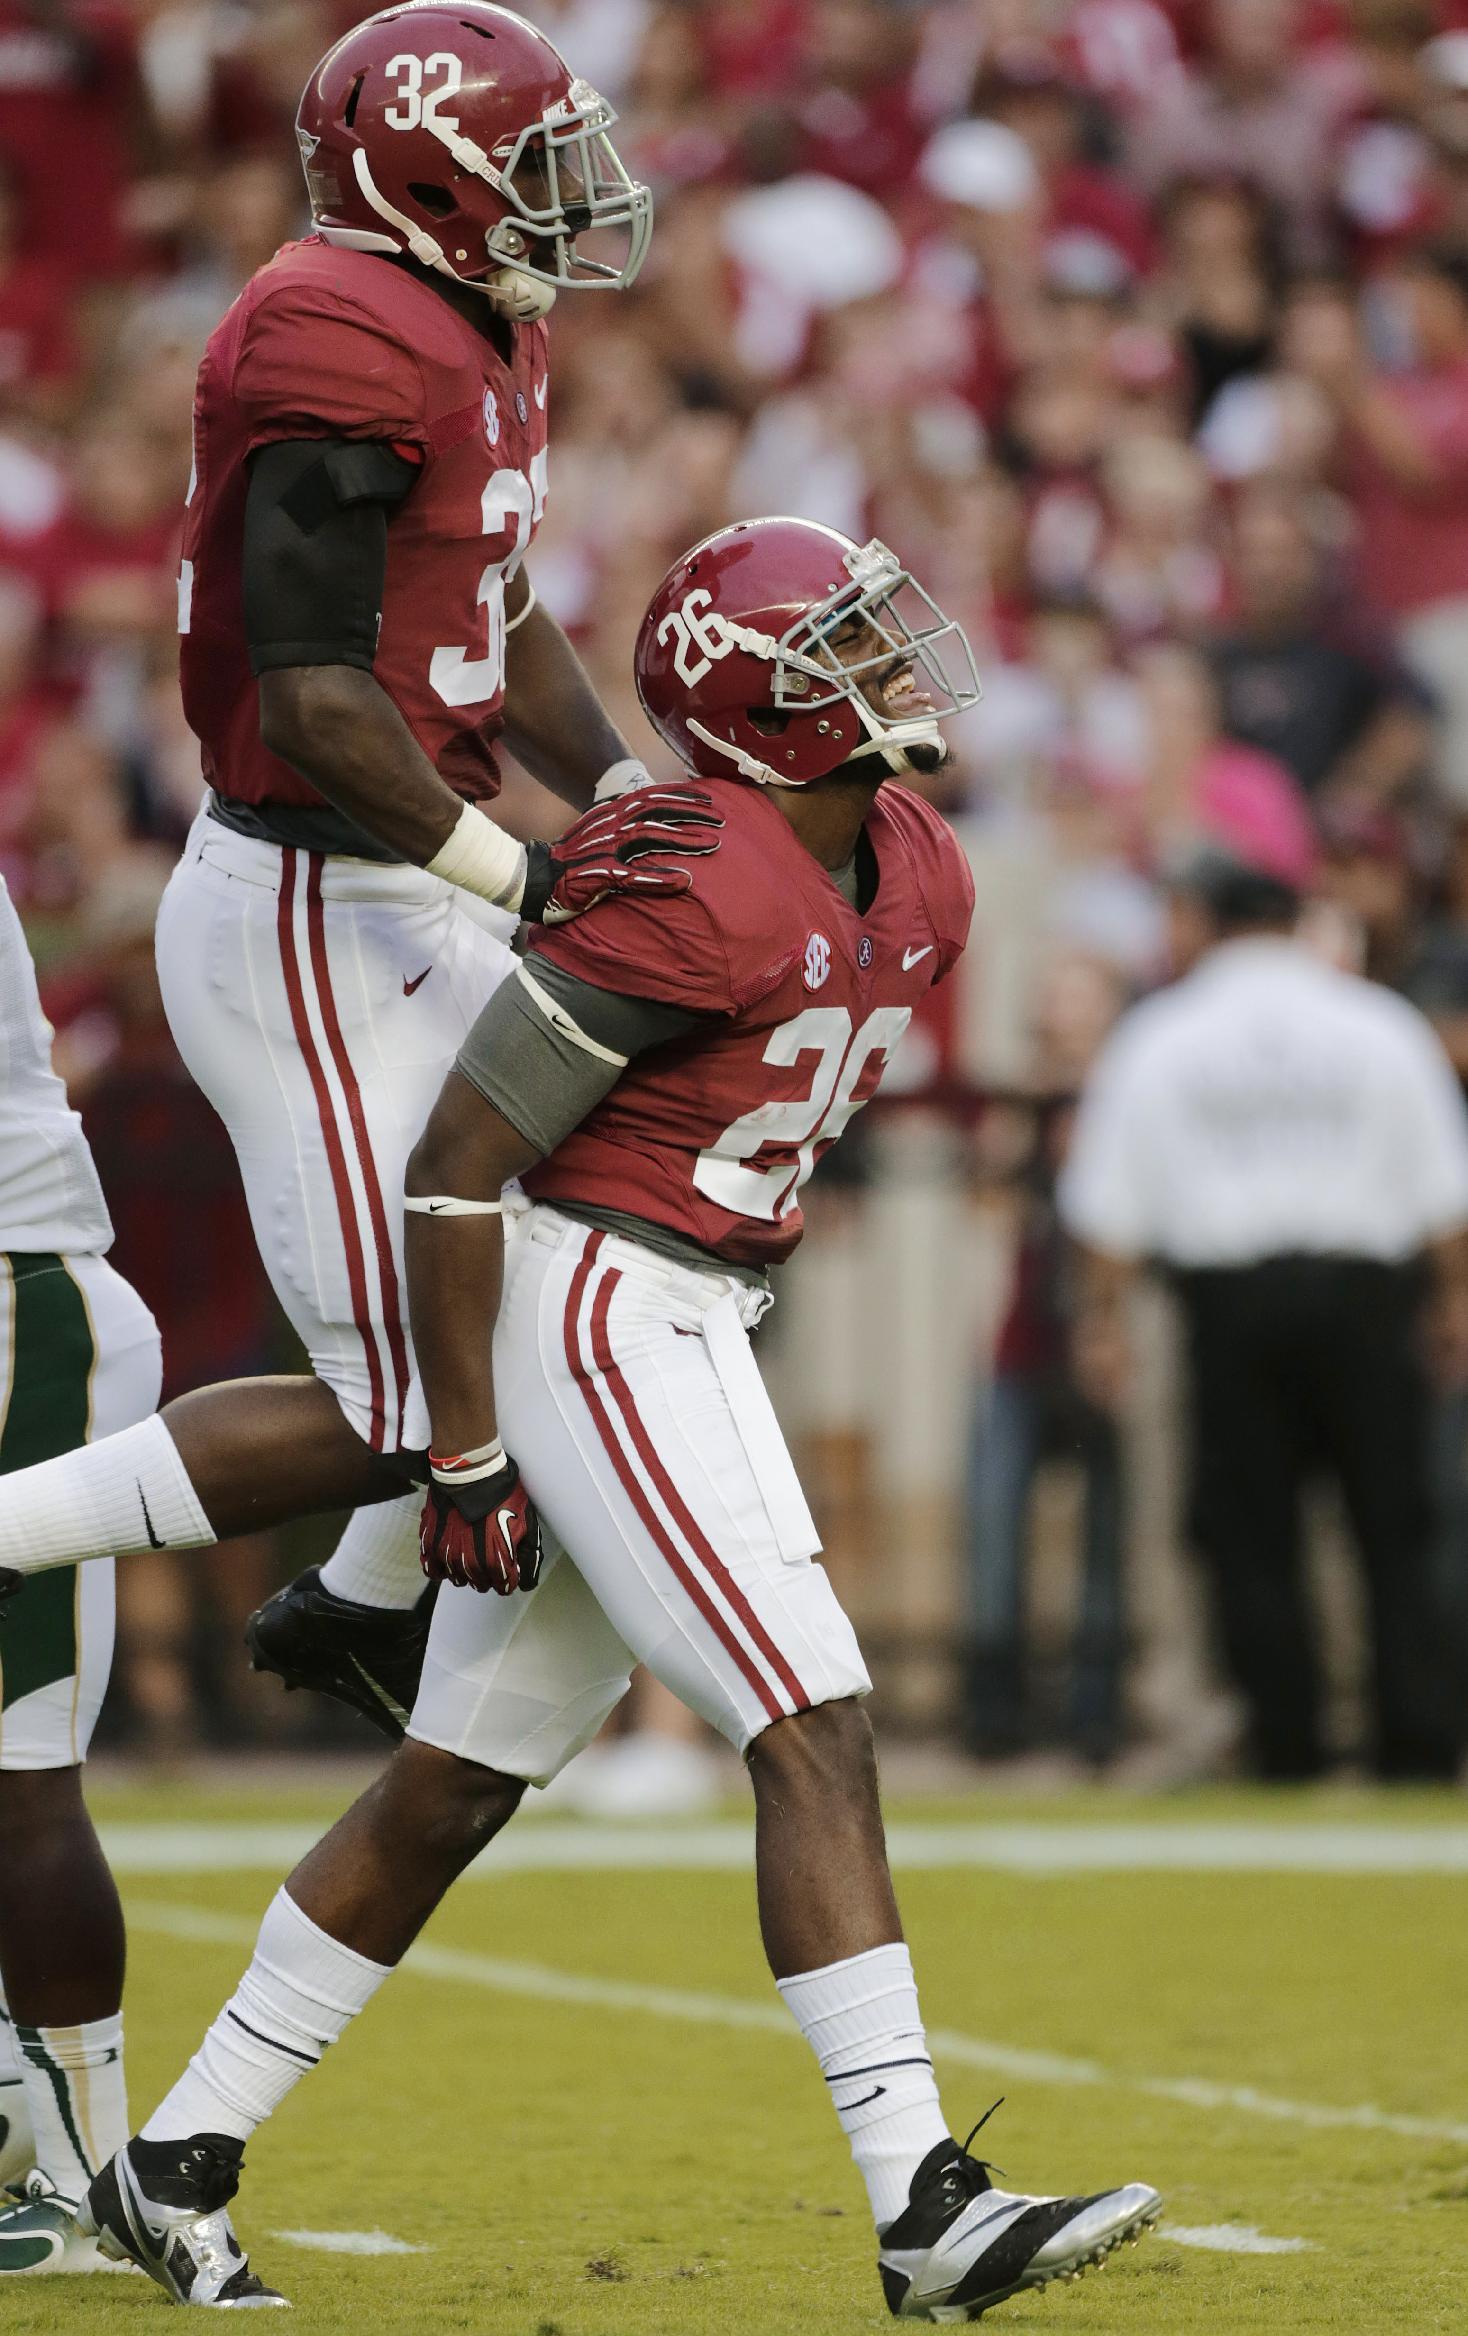 Bama seeking complete game vs. No. 21 Mississippi